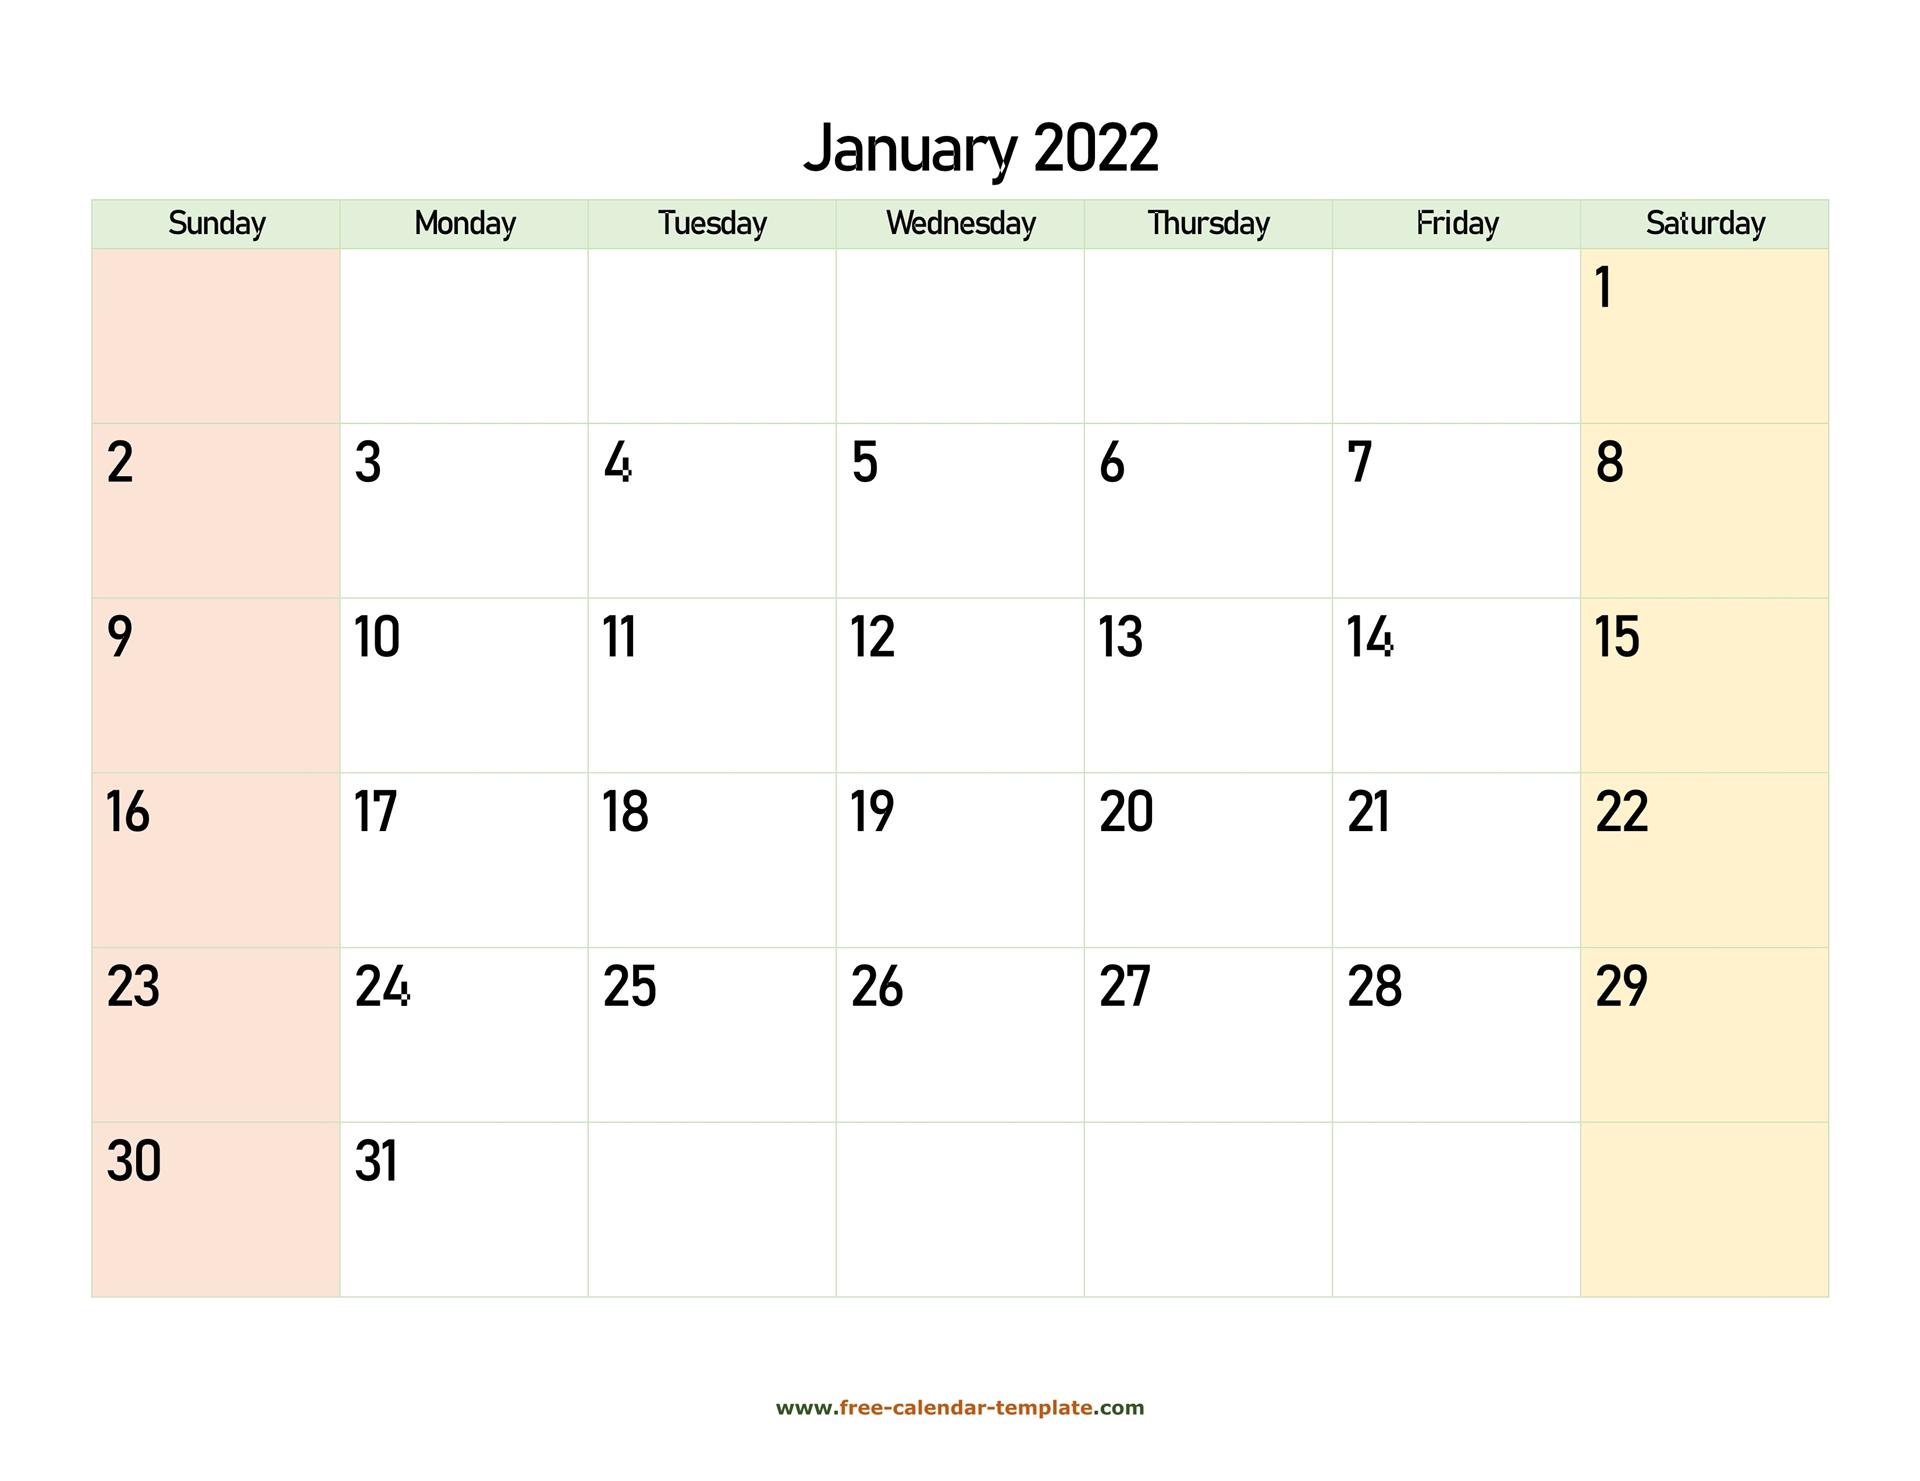 January 2022 Free Calendar Tempplate | Free Calendar In January 2022 Free Printable Calendar